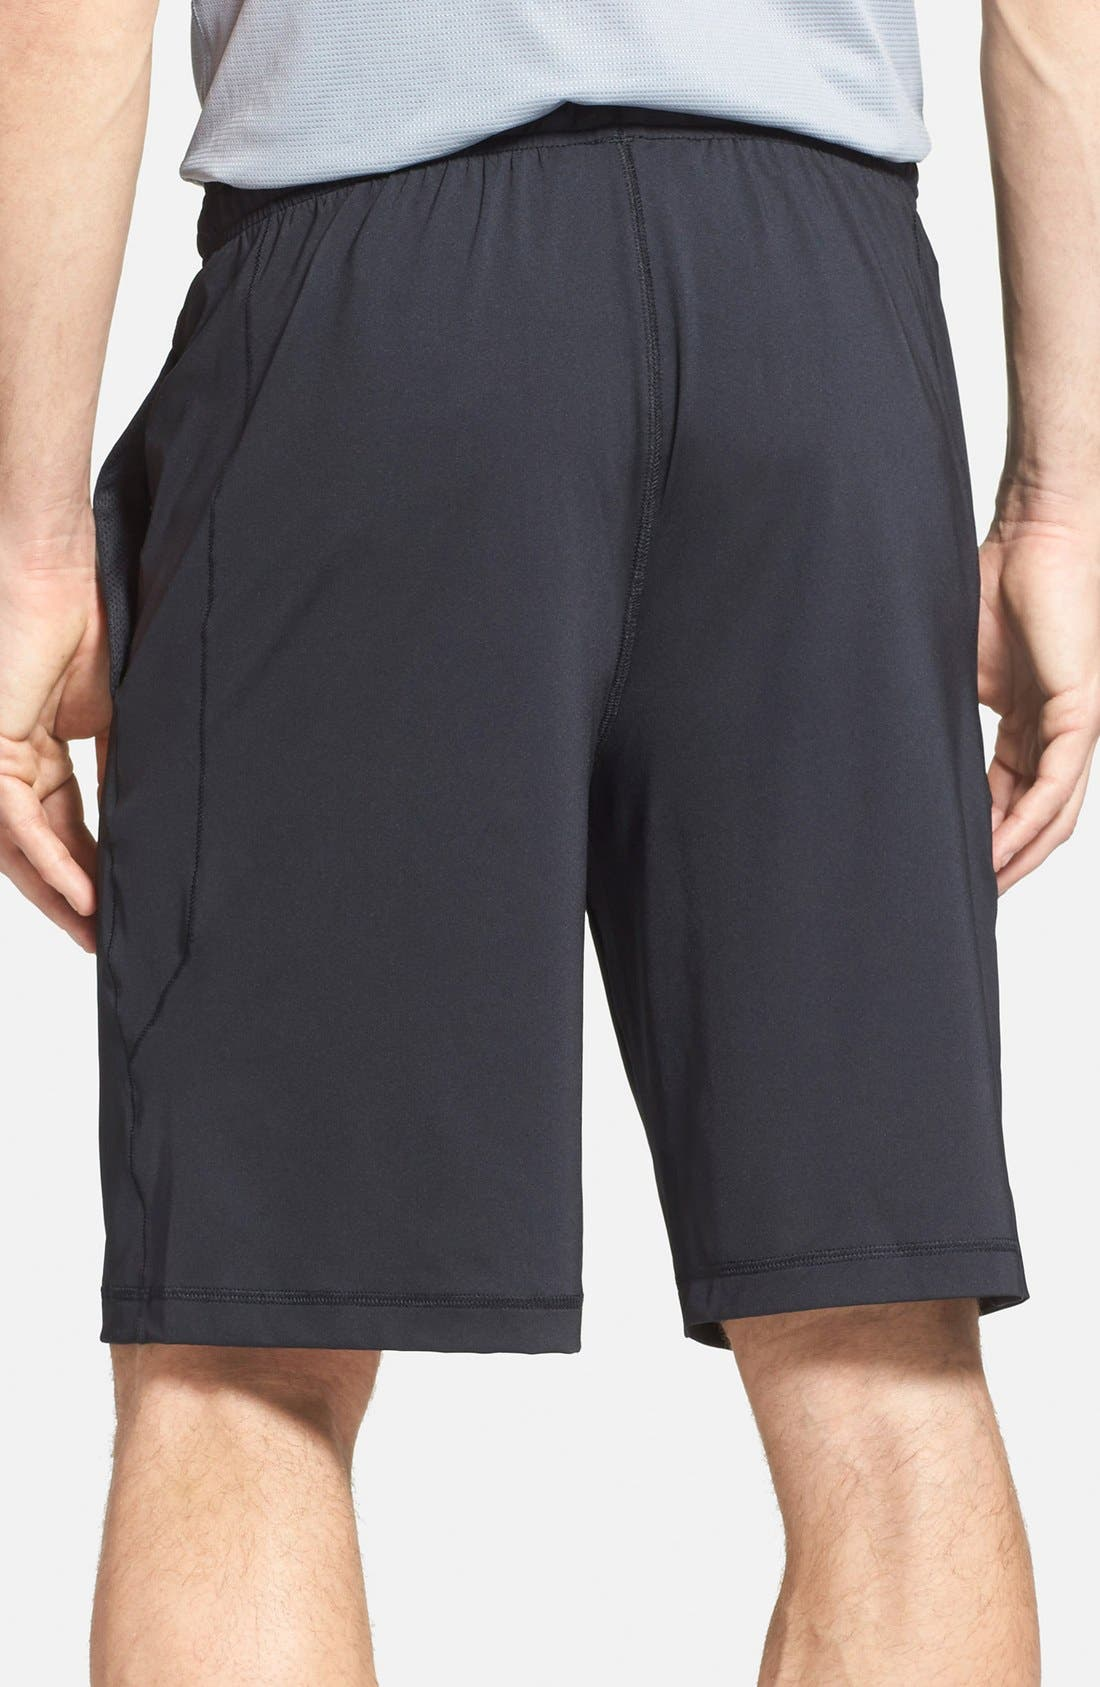 'Raid' HeatGear<sup>®</sup> Loose-Fit Athletic Shorts,                             Alternate thumbnail 5, color,                             001